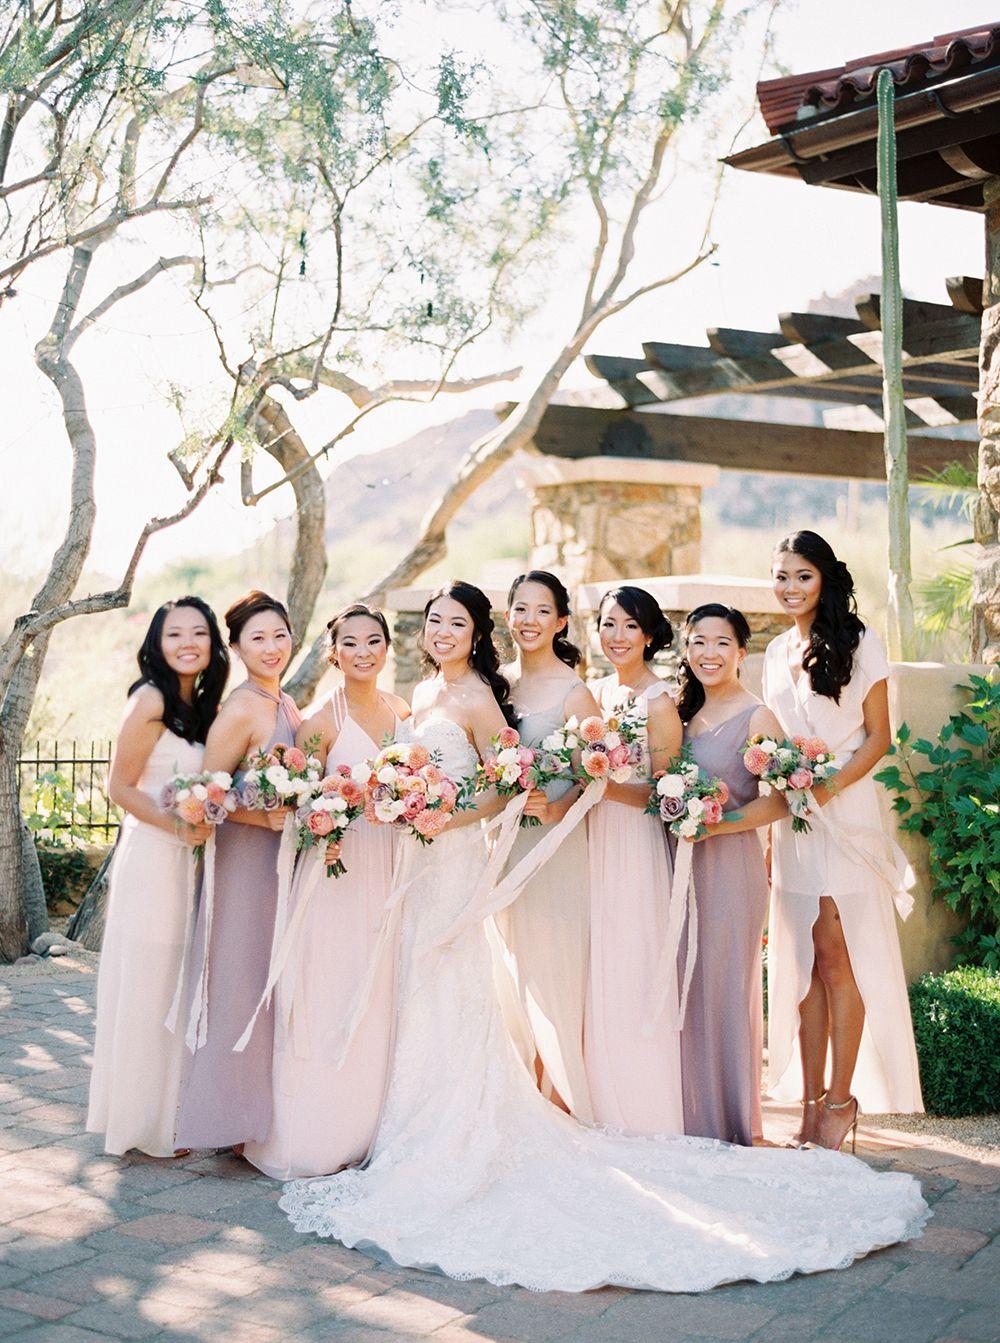 bcc9cb63cf5 Blush Taupe Bridesmaid Dresses - Gomes Weine AG